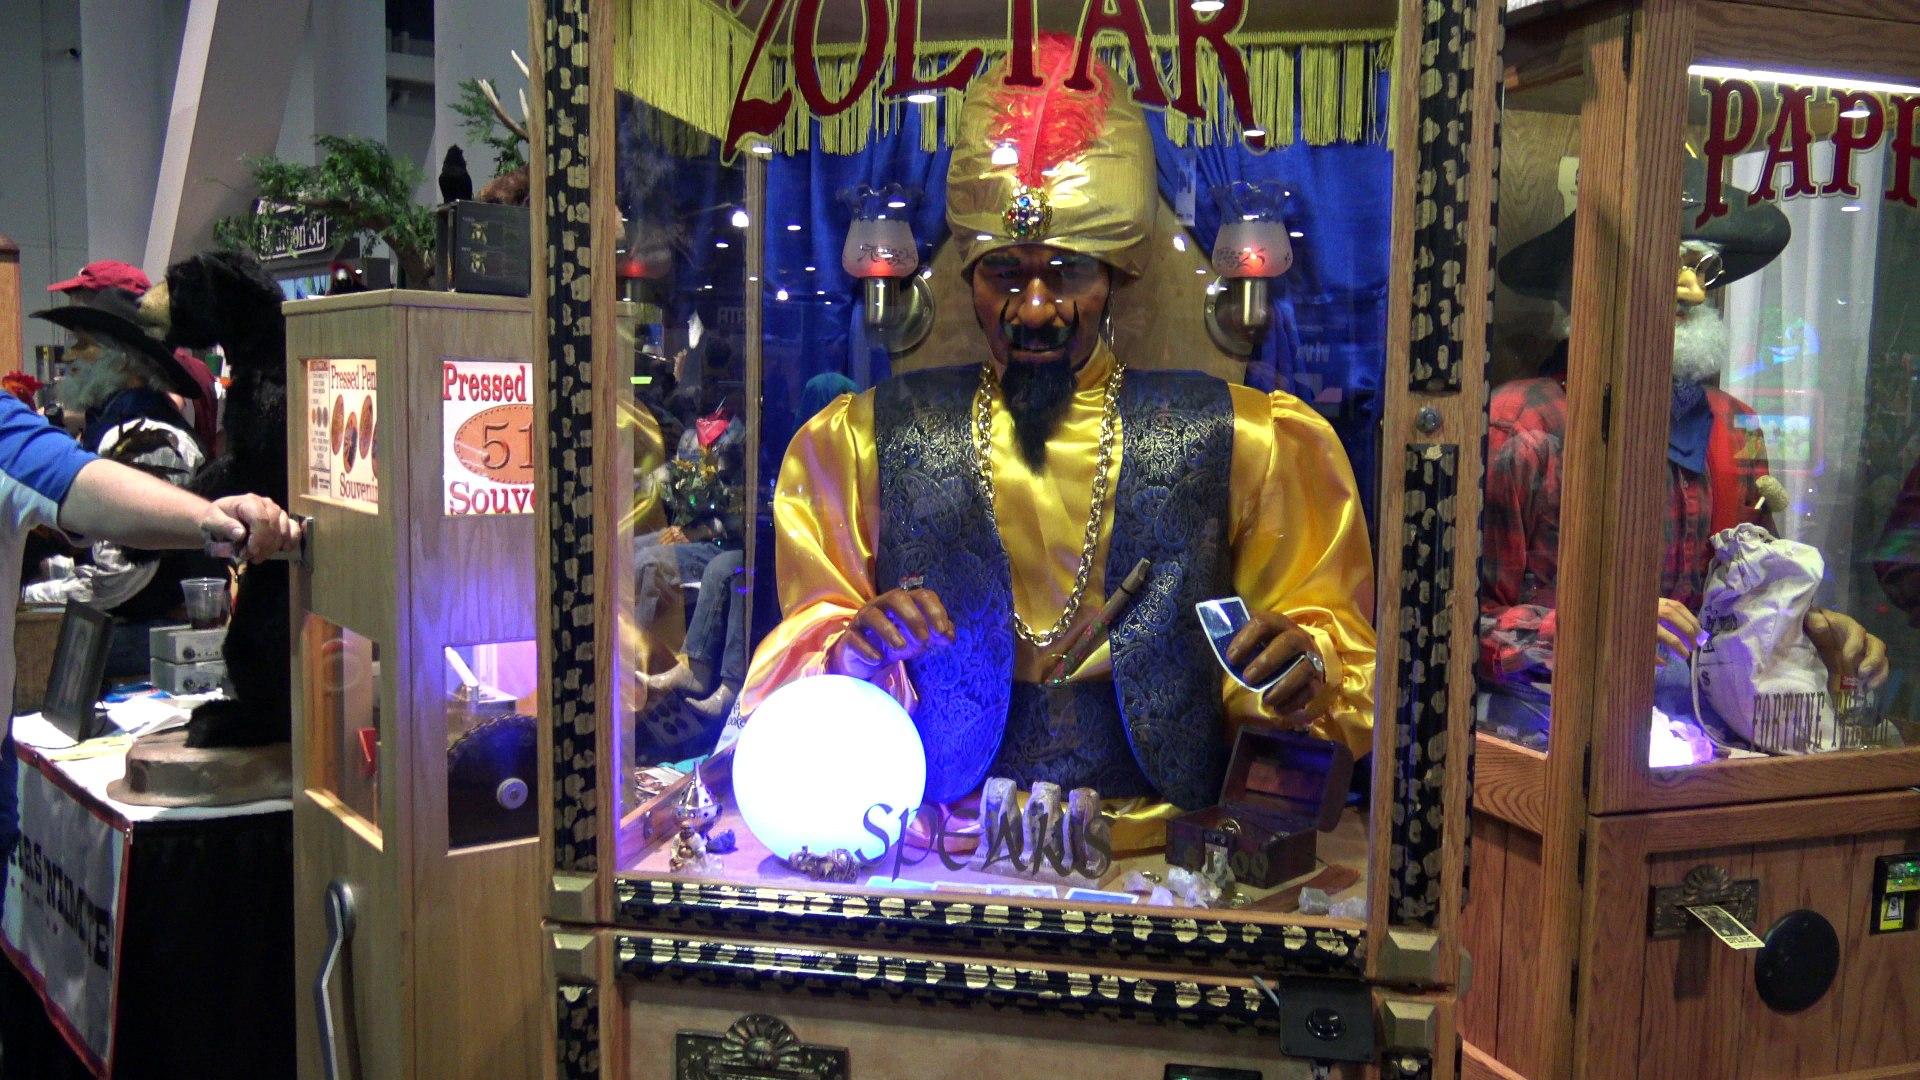 Halloween Fortune Teller Animatronic.Zoltar Fortune Teller Machines Other Animatronics By Characters Unlimited Amusement Expo 2018